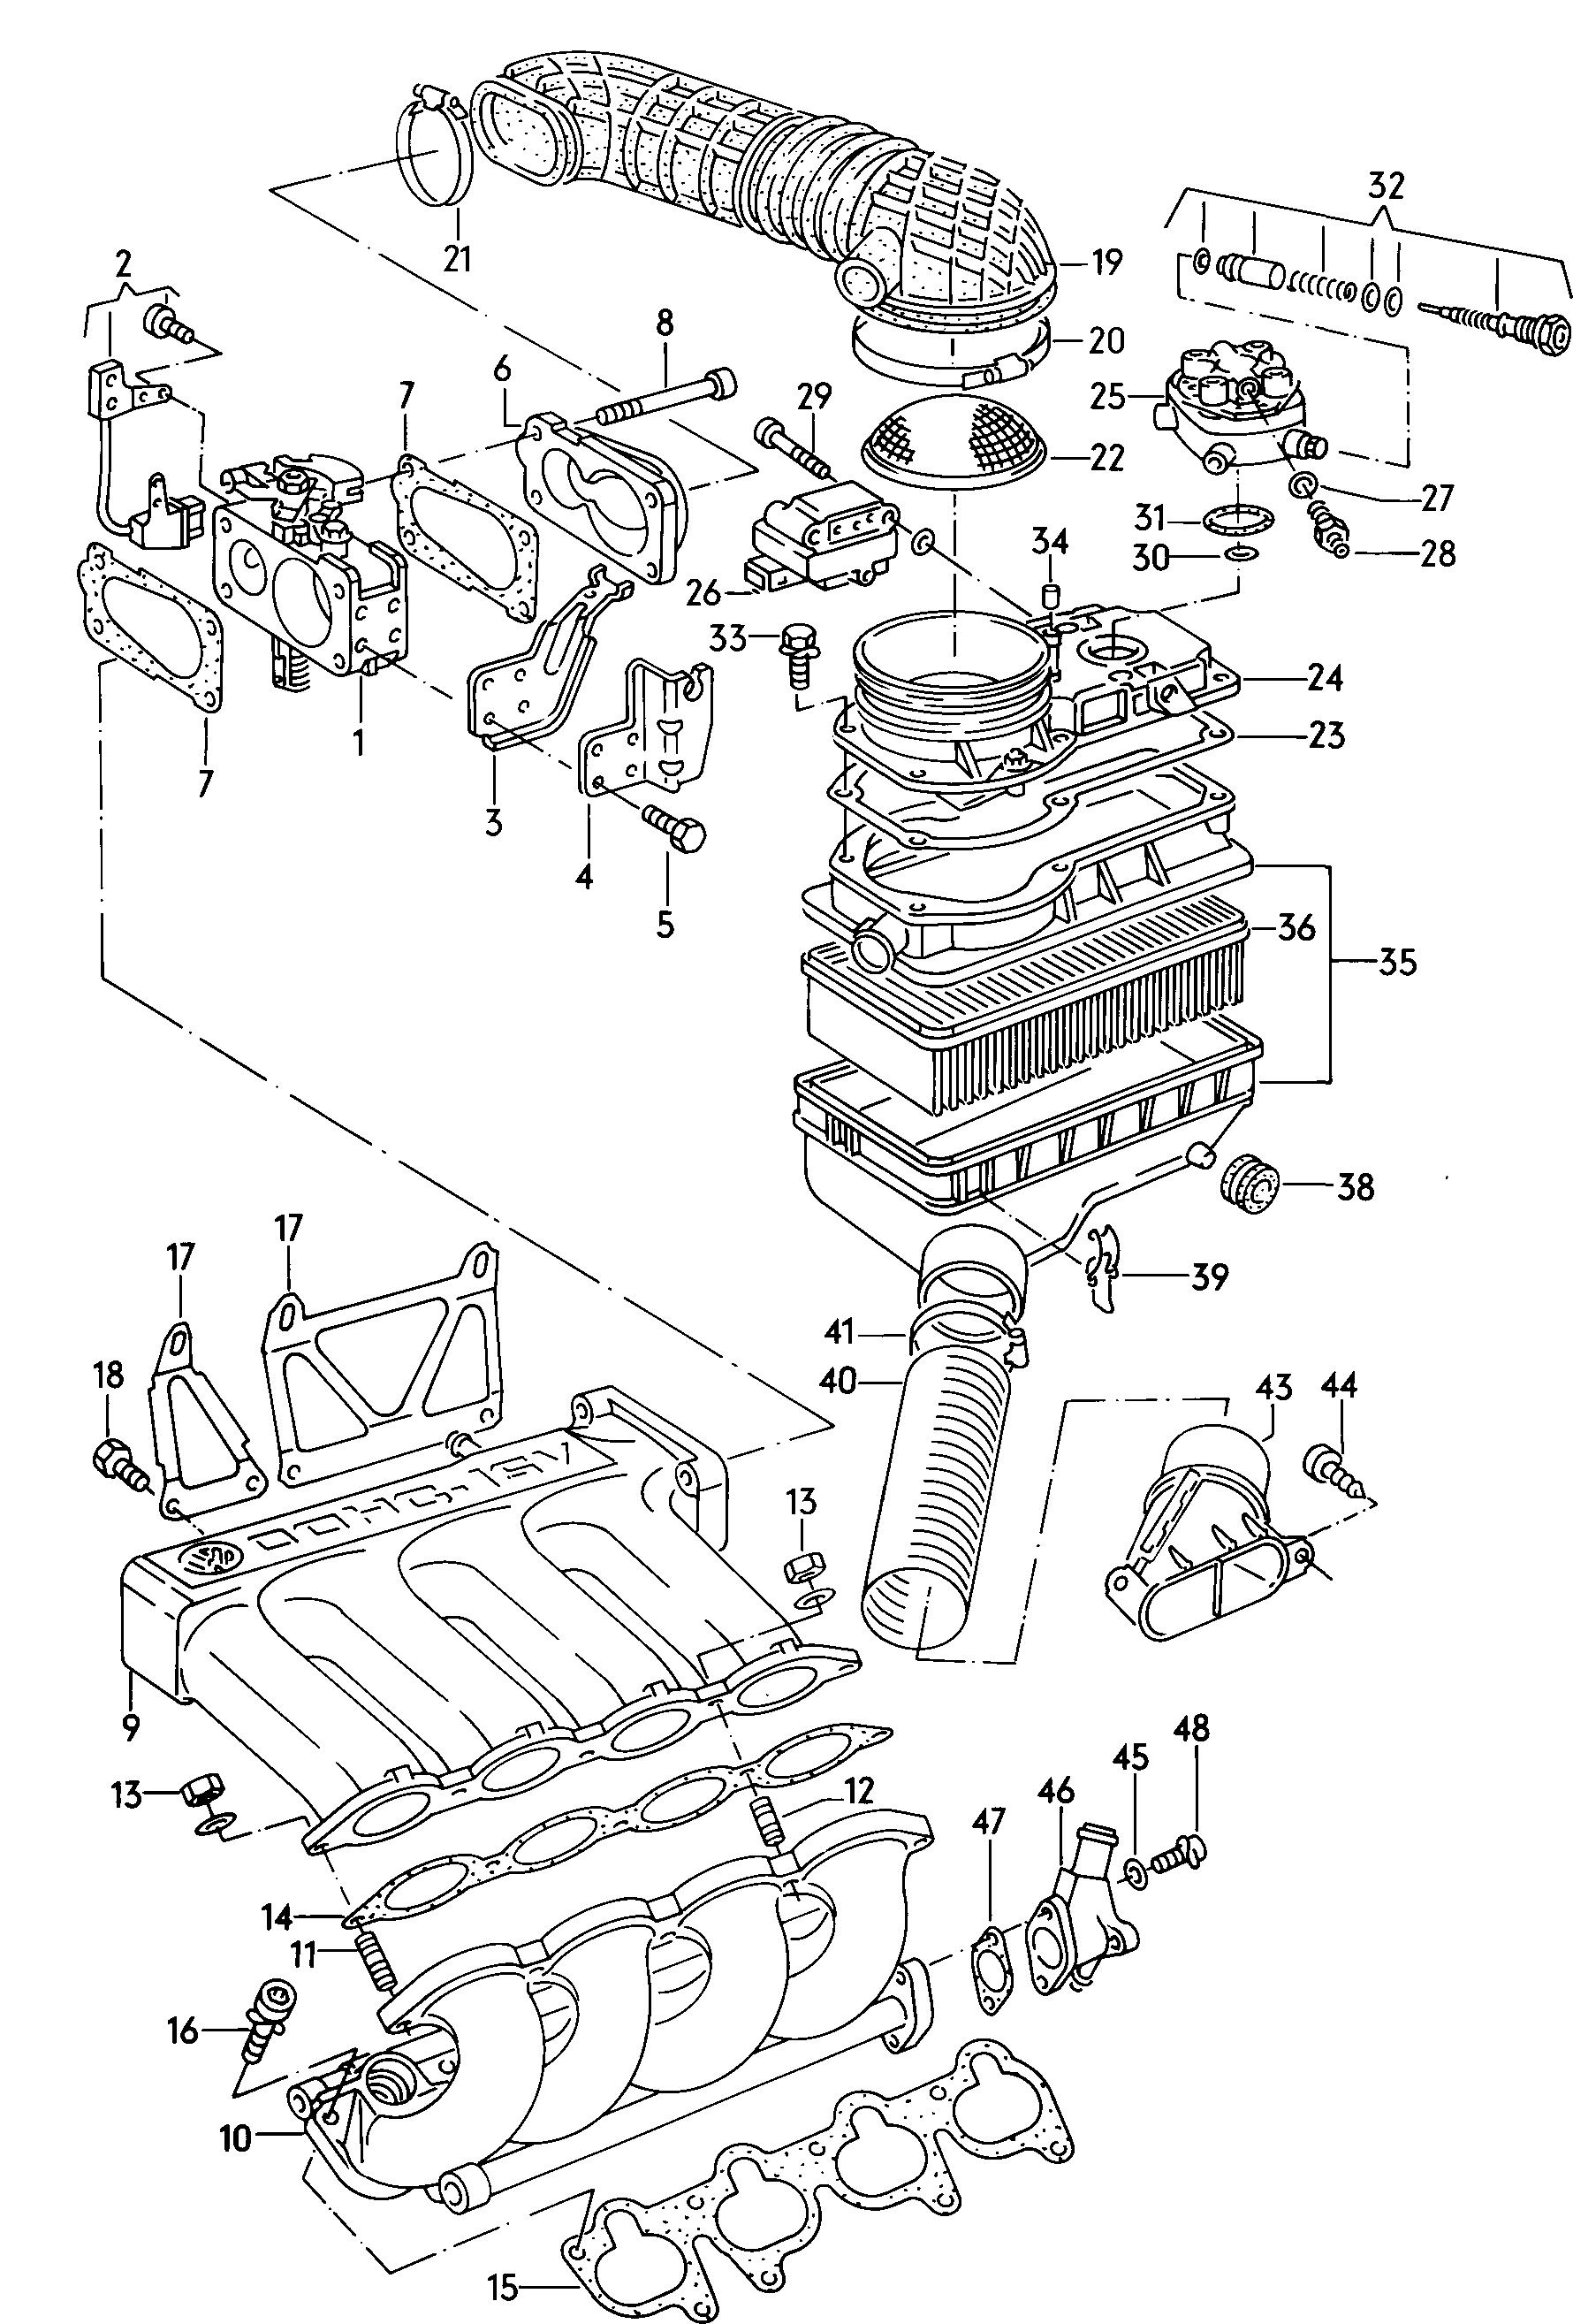 Vw Scirocco Europe 1988 Engine 4850 Catcar Info